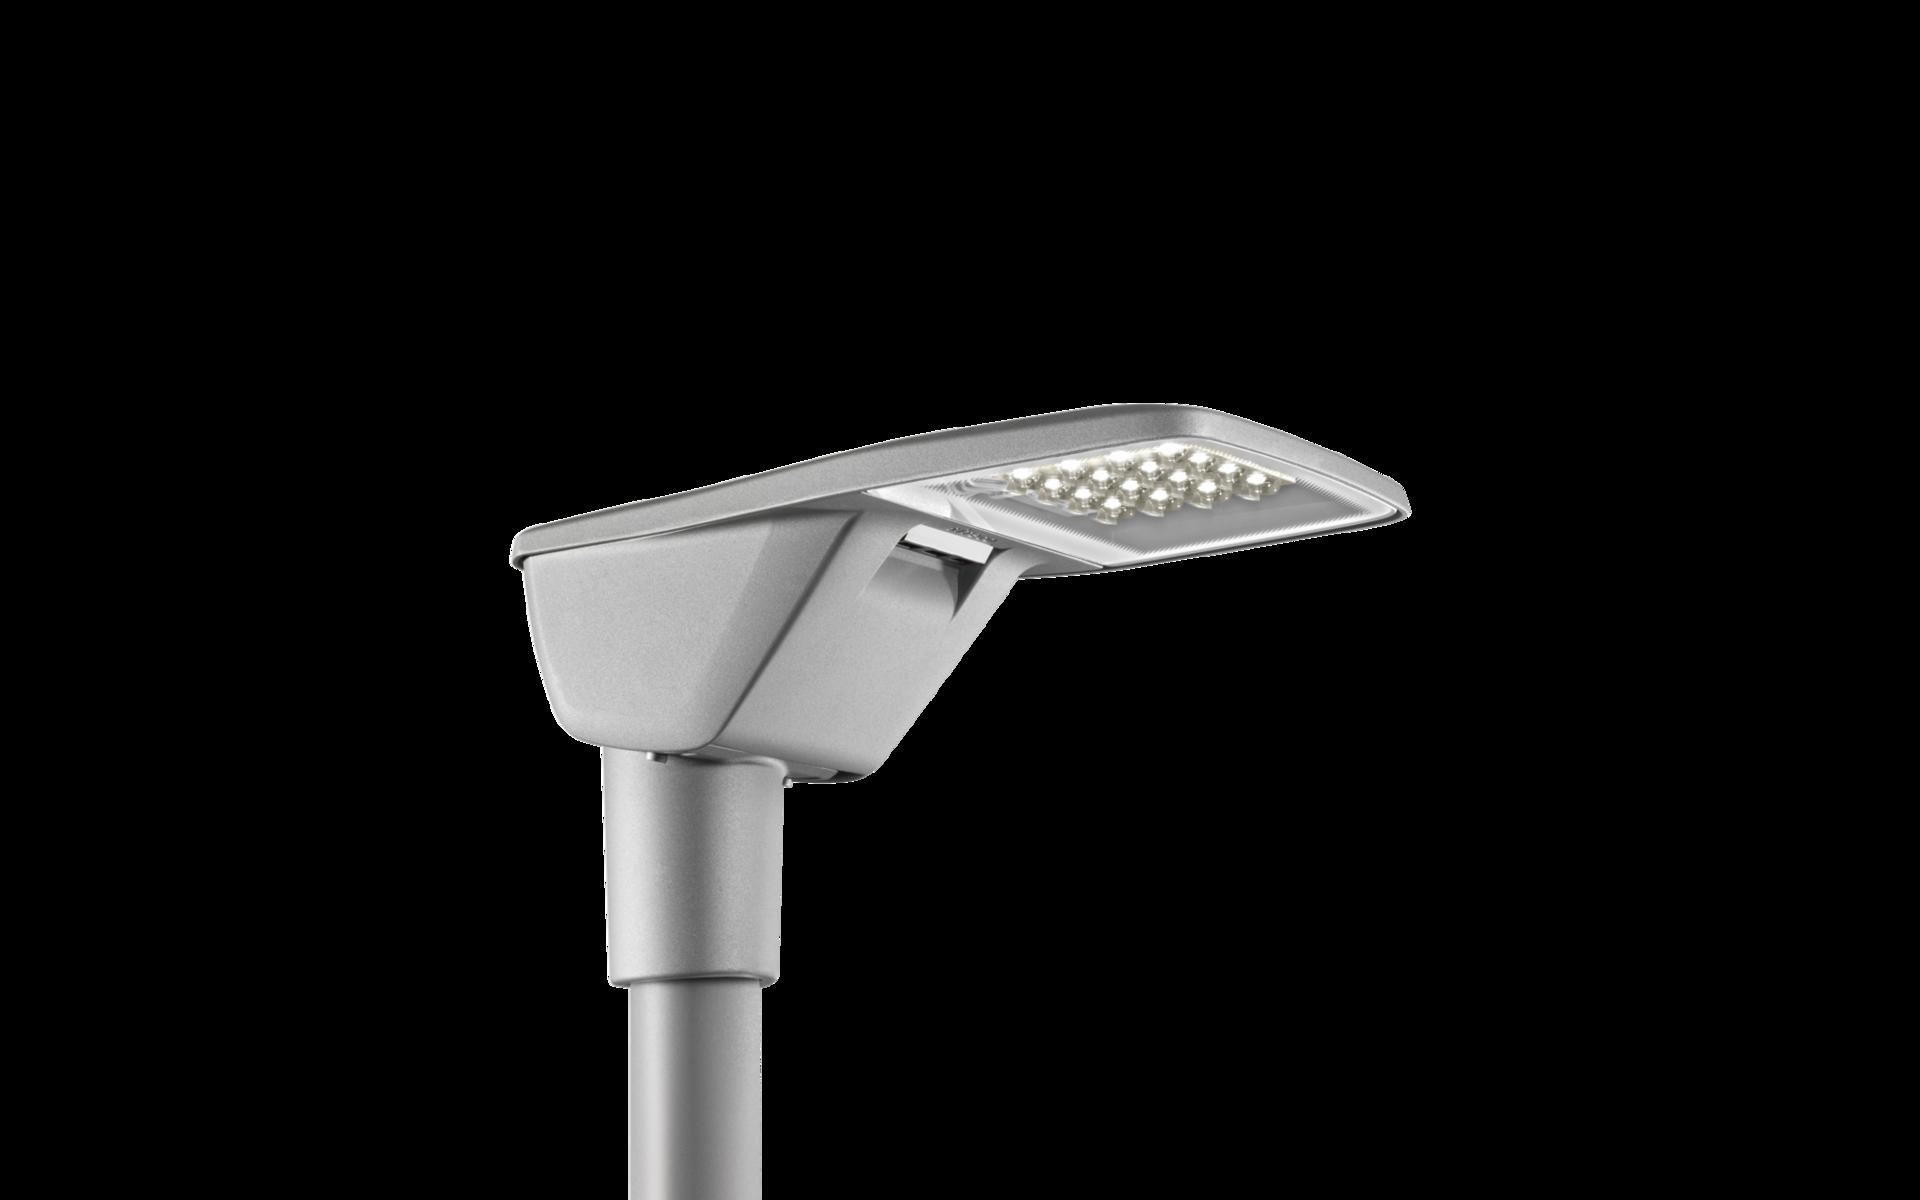 sielight-lightning-proionta-streetlight-20-micro